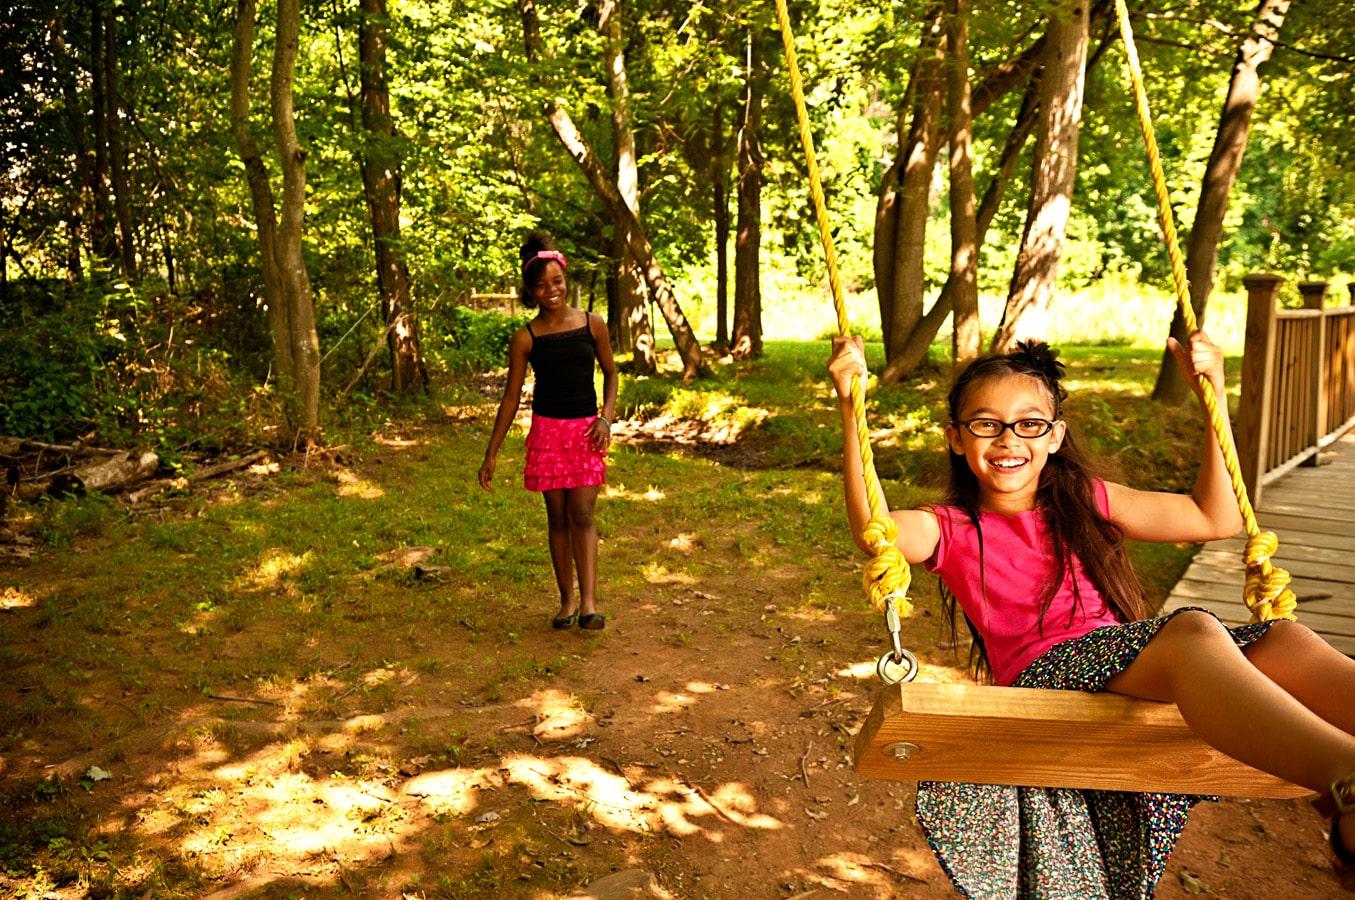 children, portrait, outdoor, swing, natural light, Northern VA